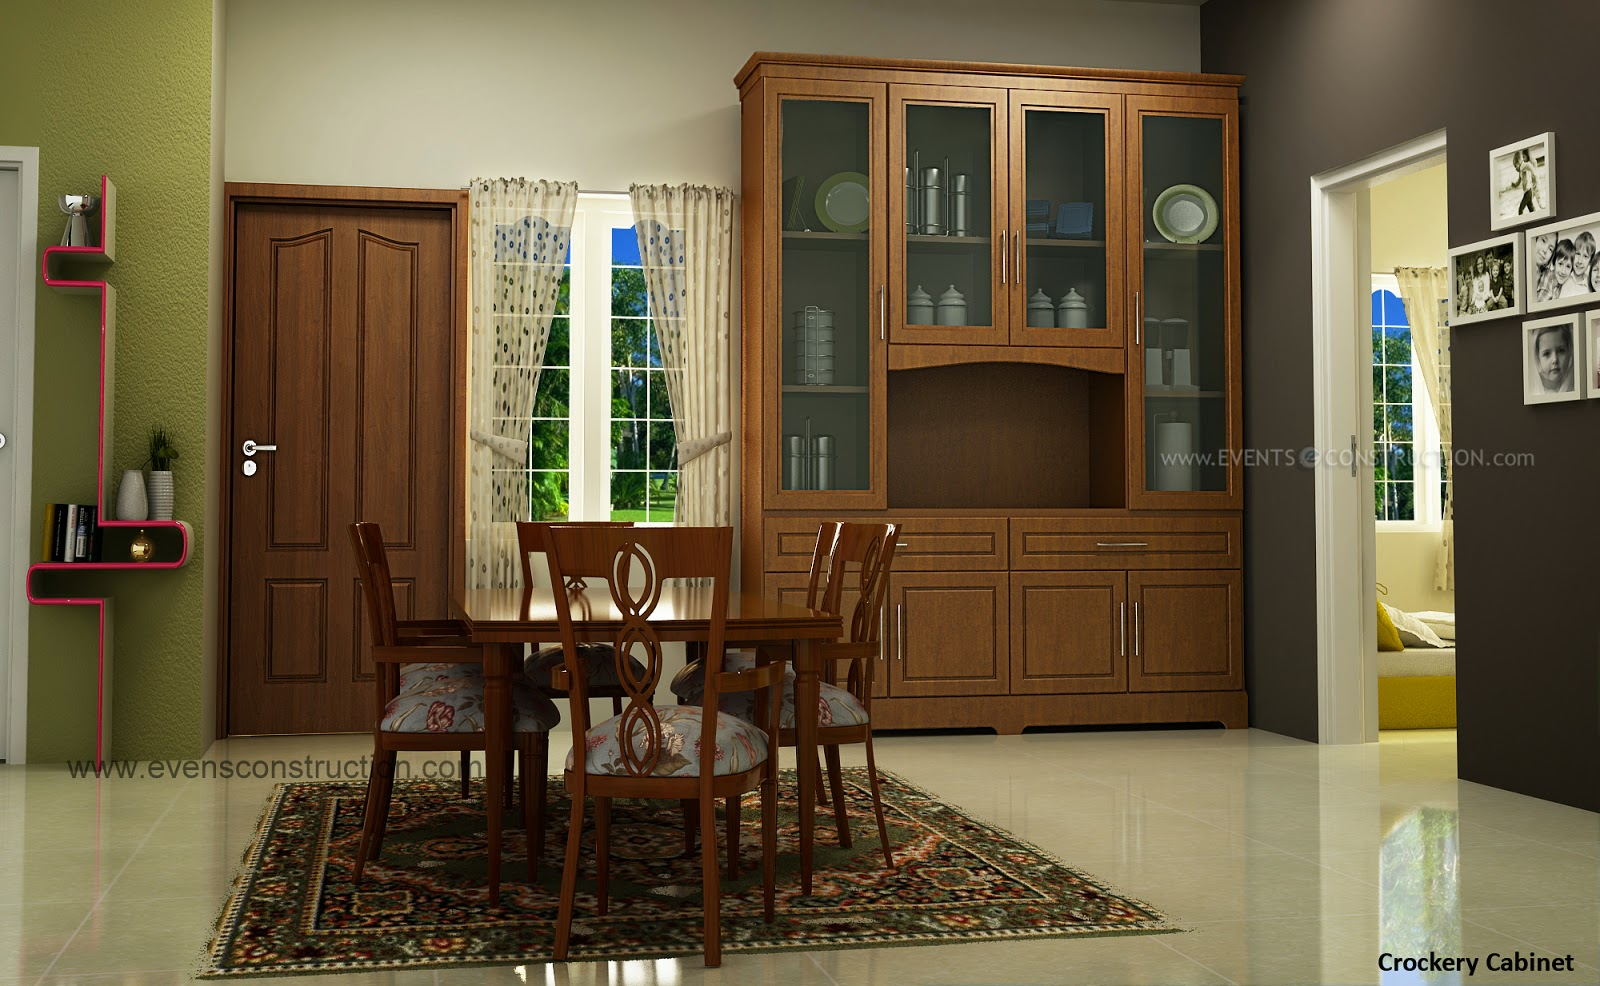 Evens Construction Pvt Ltd Crockery Shelf For Dining Room